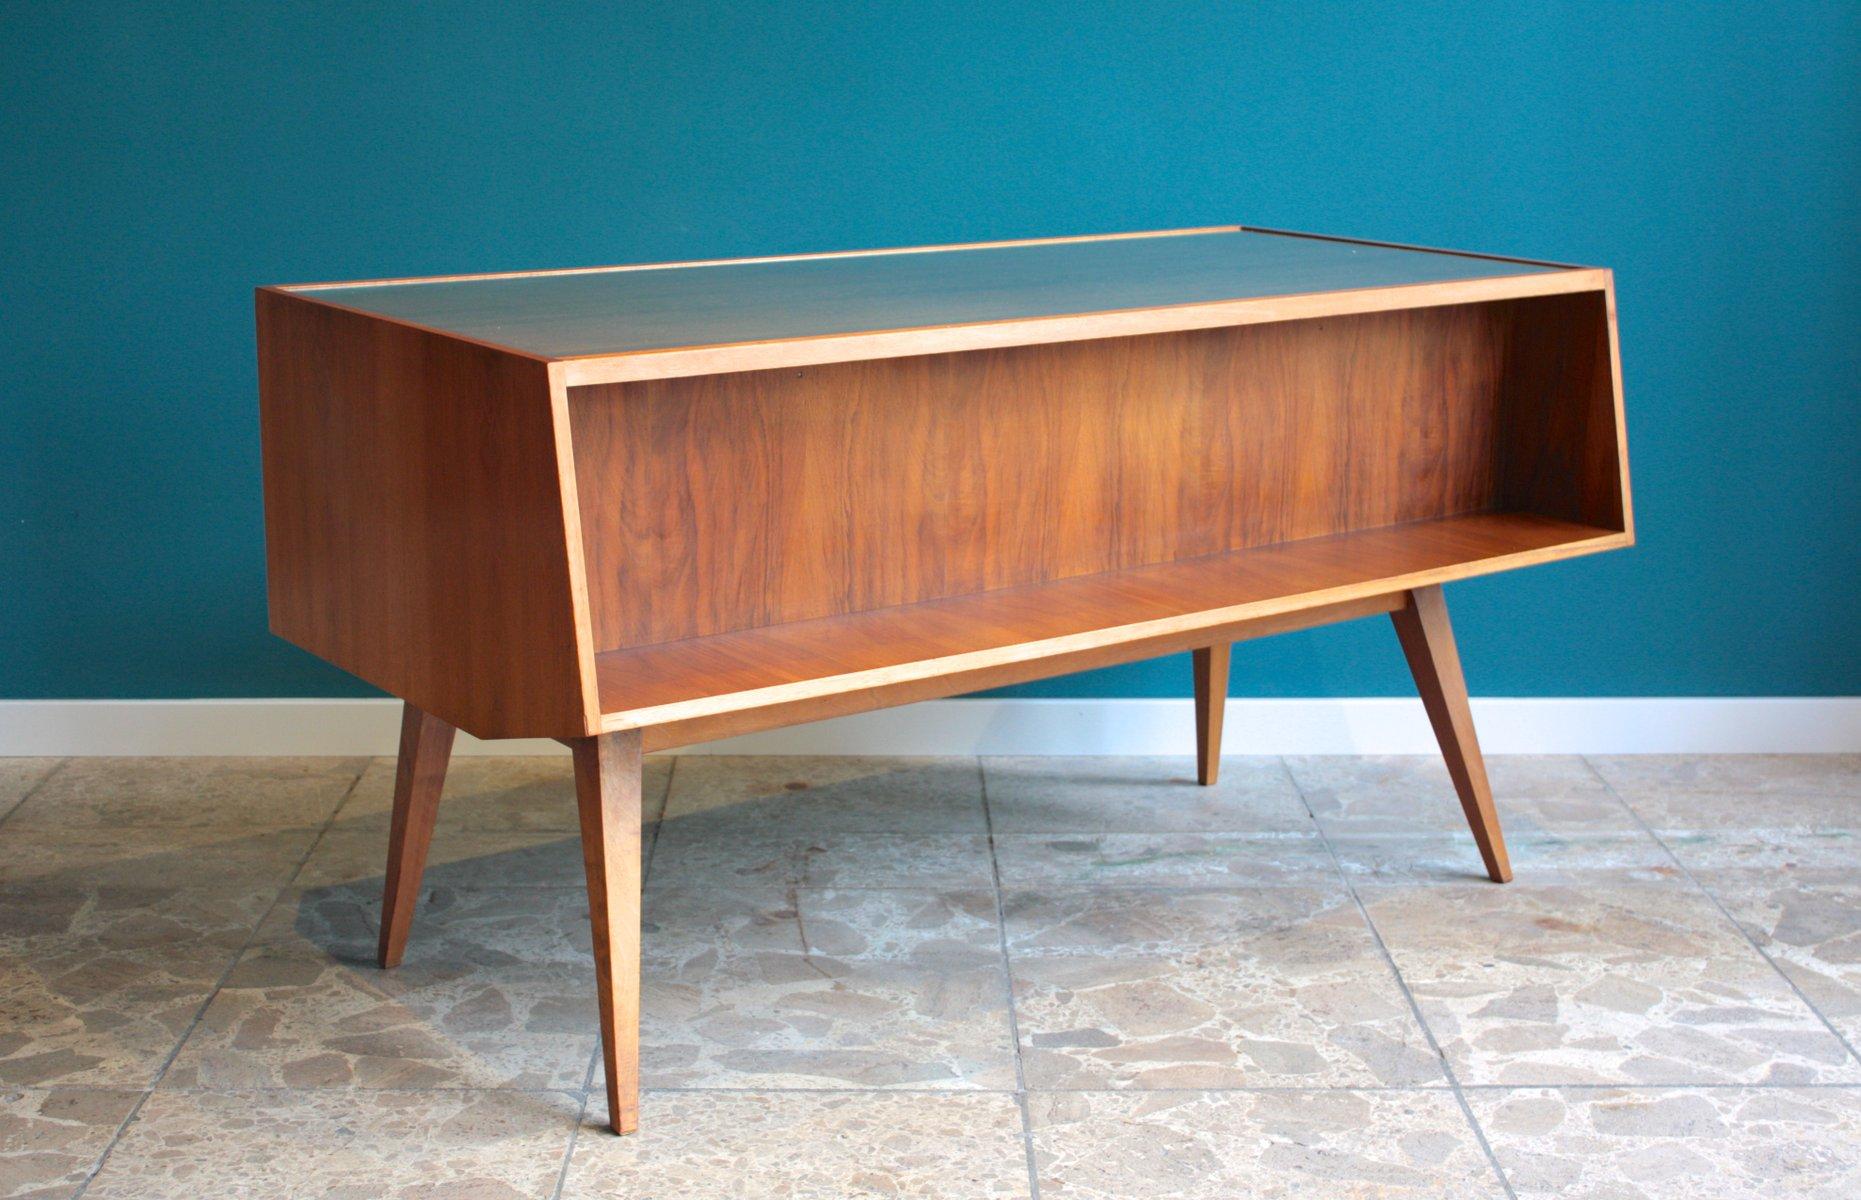 bureau en bois verre allemagne 1950s en vente sur pamono. Black Bedroom Furniture Sets. Home Design Ideas